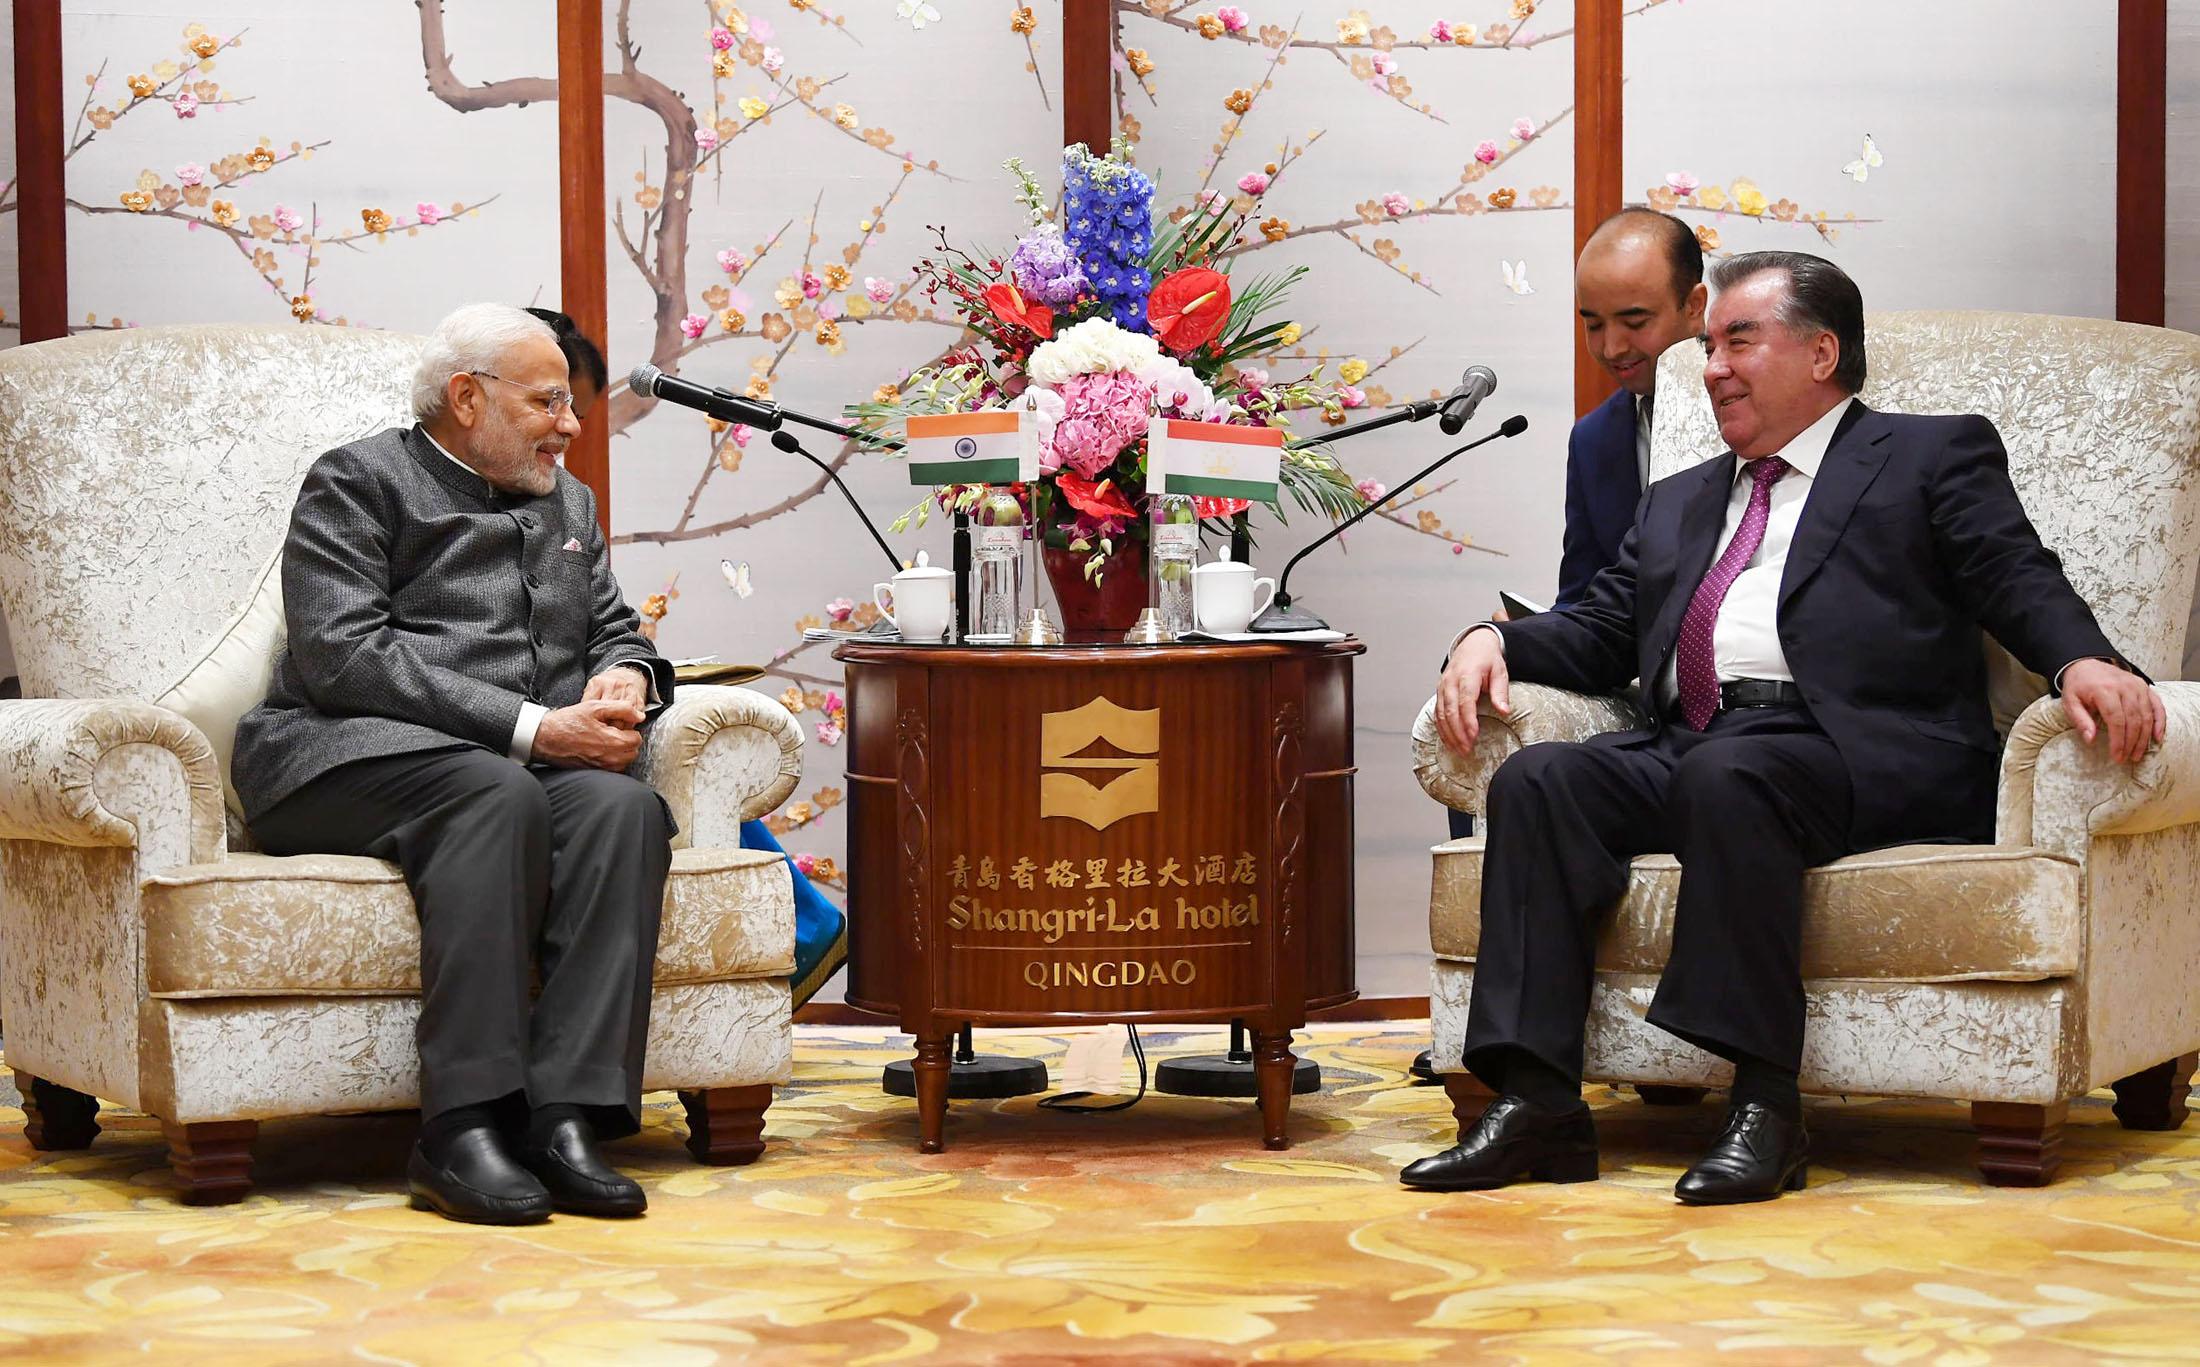 The Prime Minister, Shri Narendra Modi meeting the President of the Republic of Tajikistan, Mr. Emomali Rahmon, on the sidelines of the Shanghai Cooperation Organisation (SCO) Summit, in Qingdao, China on June 09, 2018.